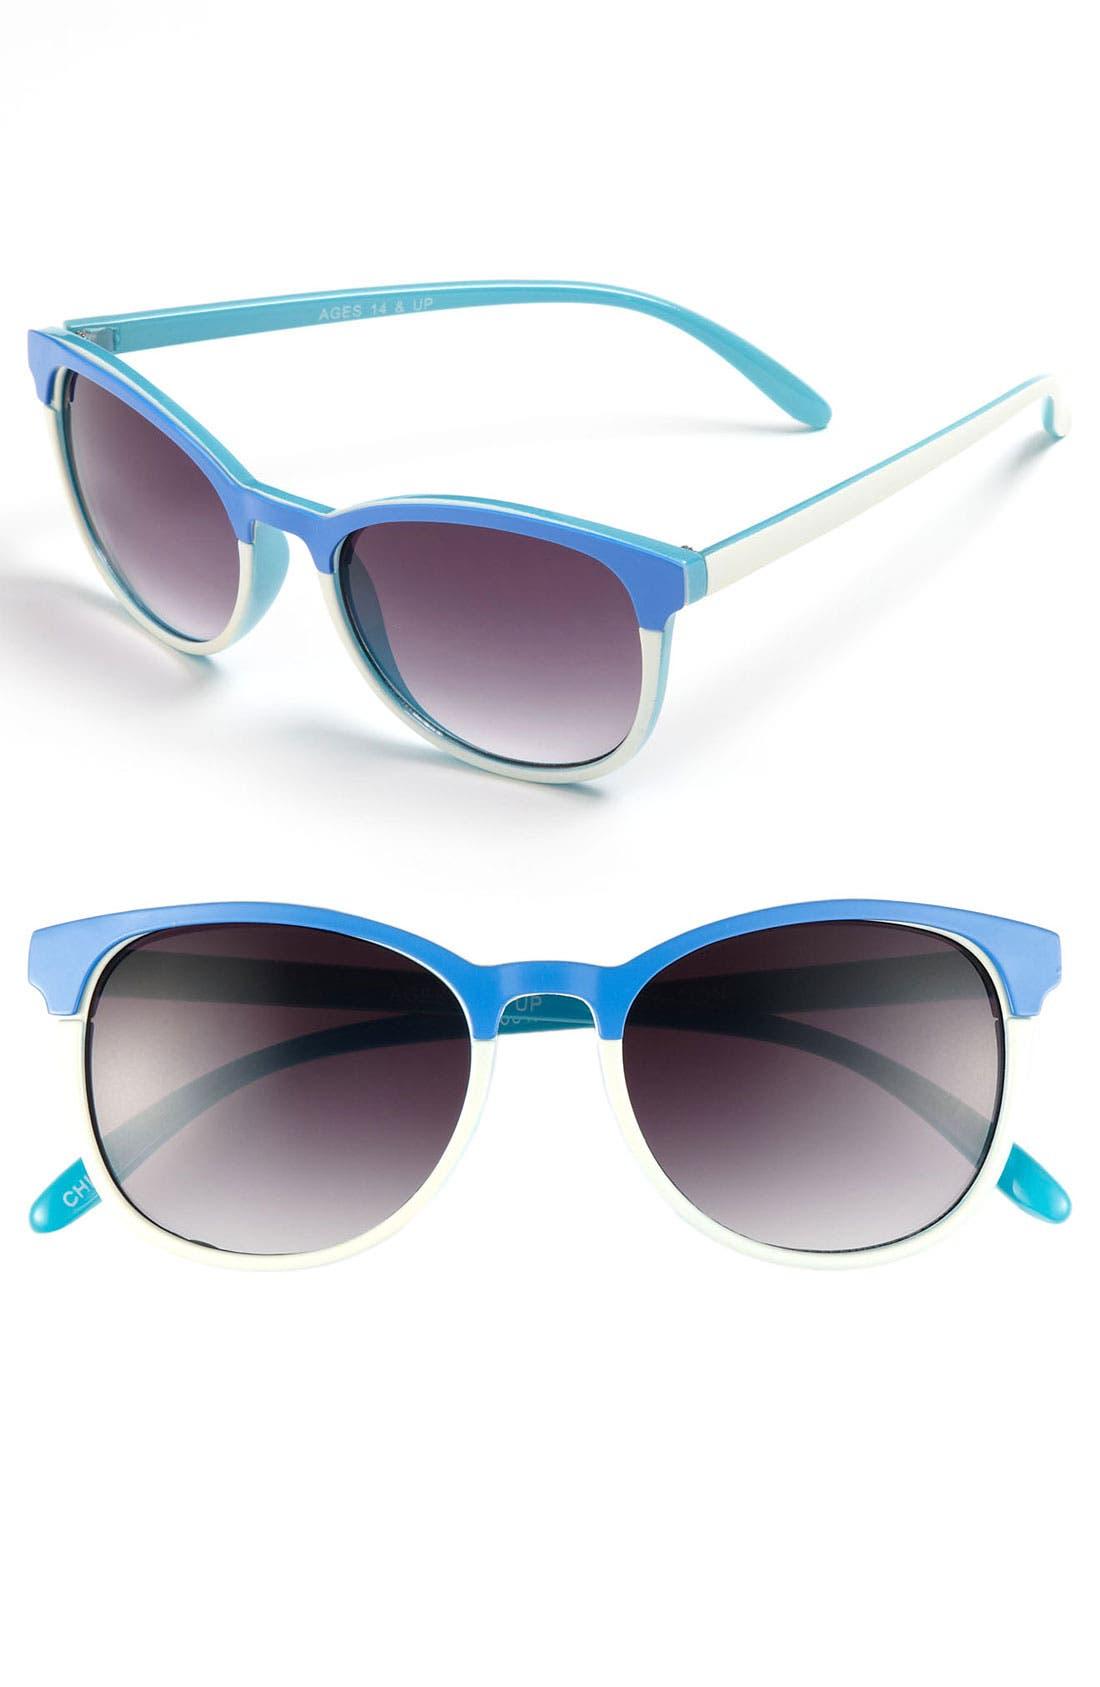 Alternate Image 1 Selected - FE NY 'Kickstart' Sunglasses